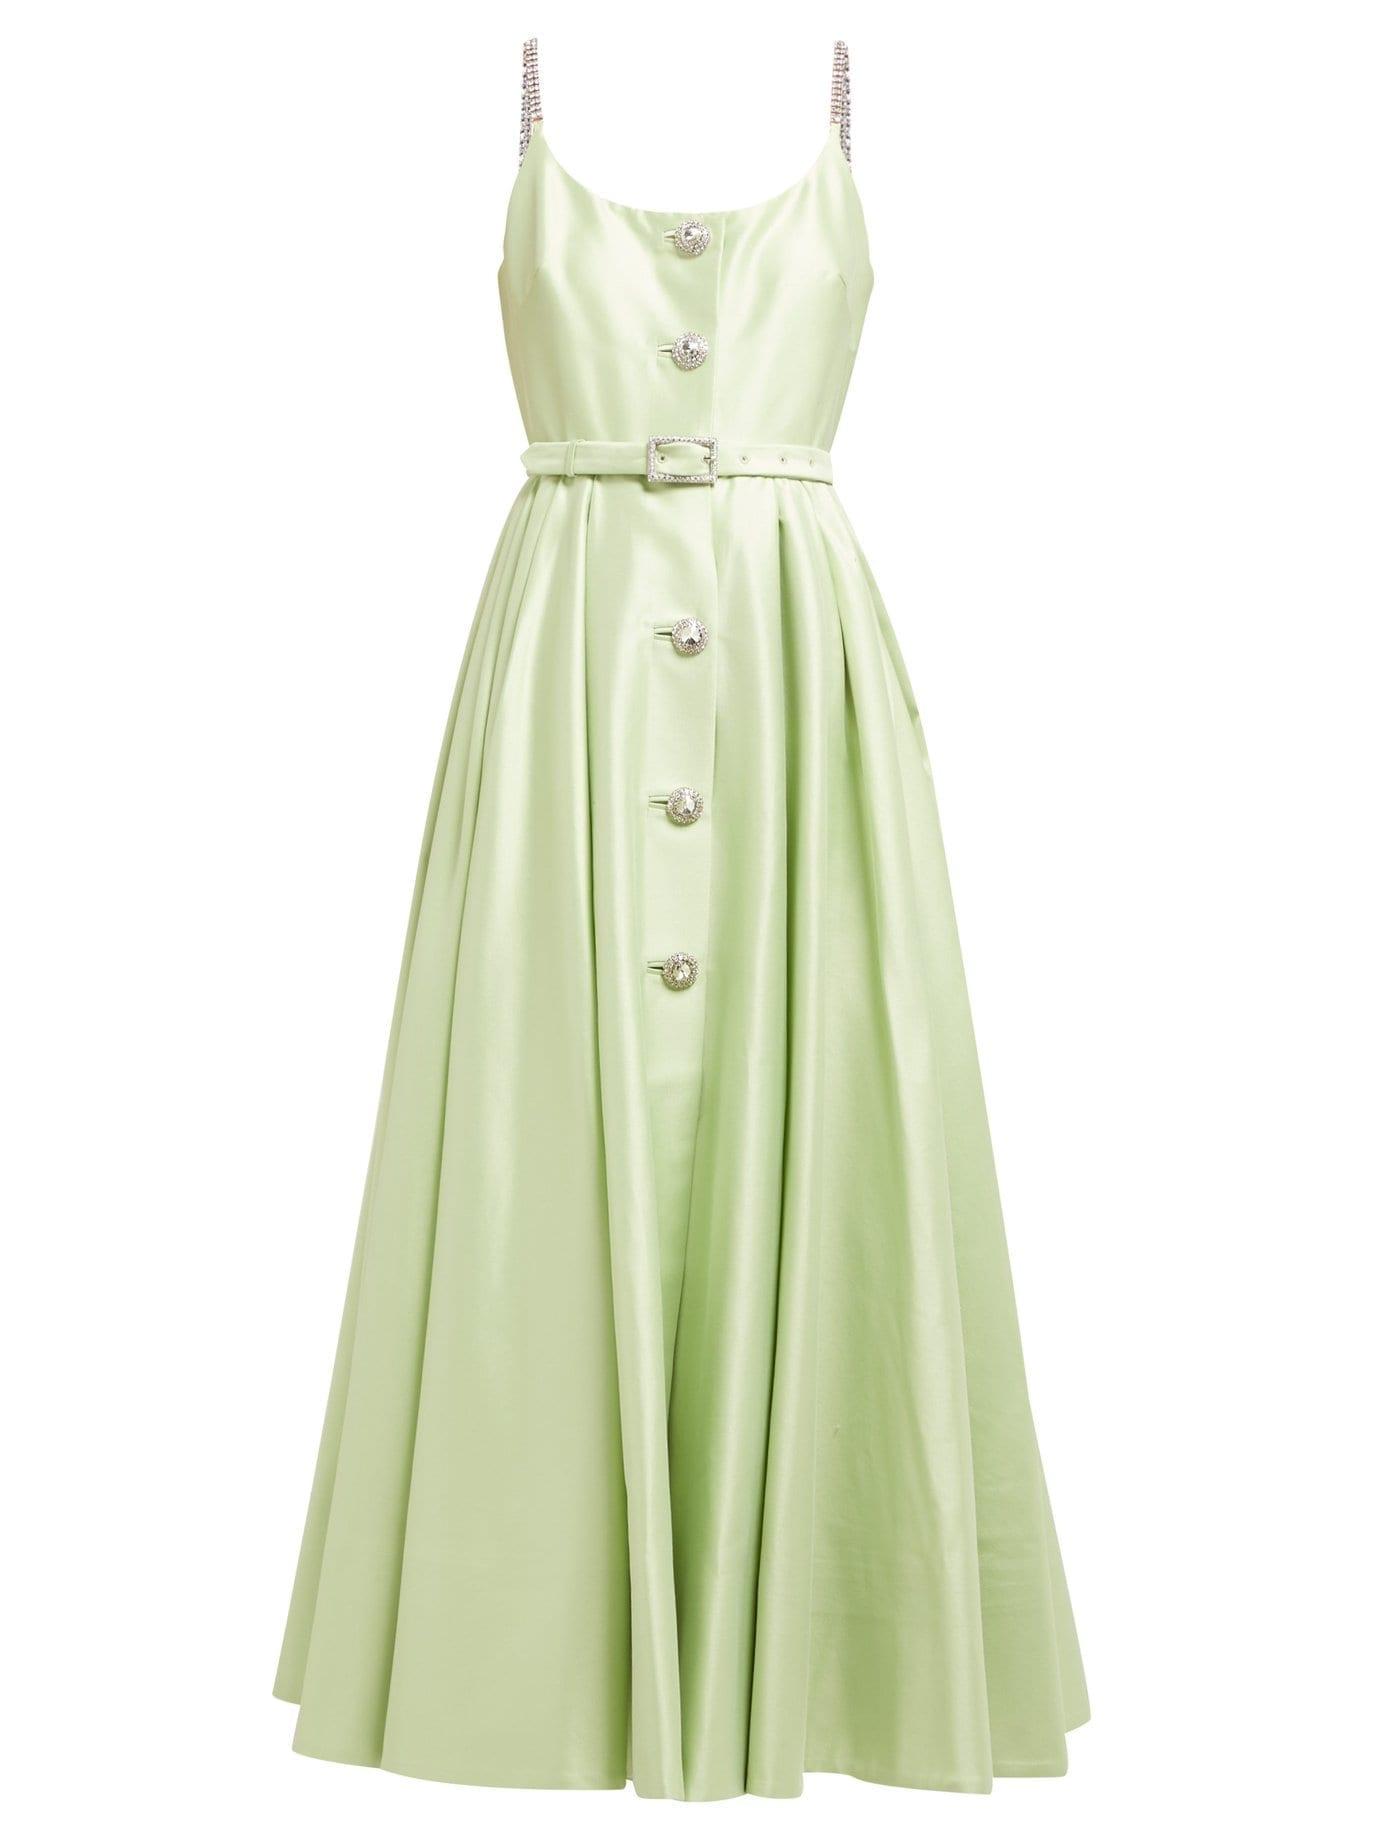 ALESSANDRA RICH Crystal-Embellished Cotton-Blend Midi Green Dress